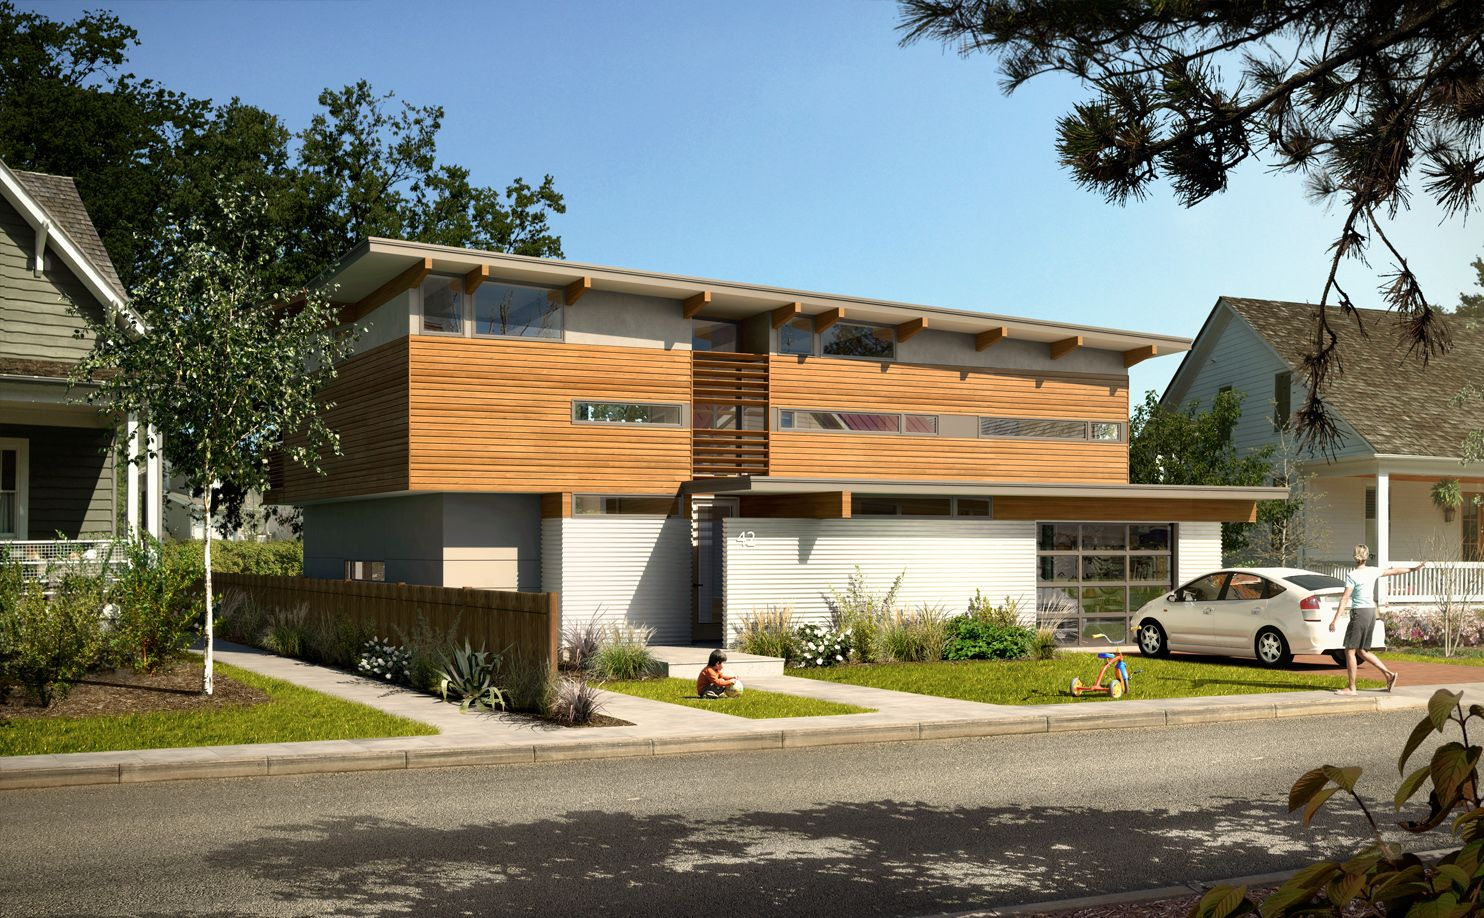 td3 2270 turkel design prefab homes pinterest prefab and